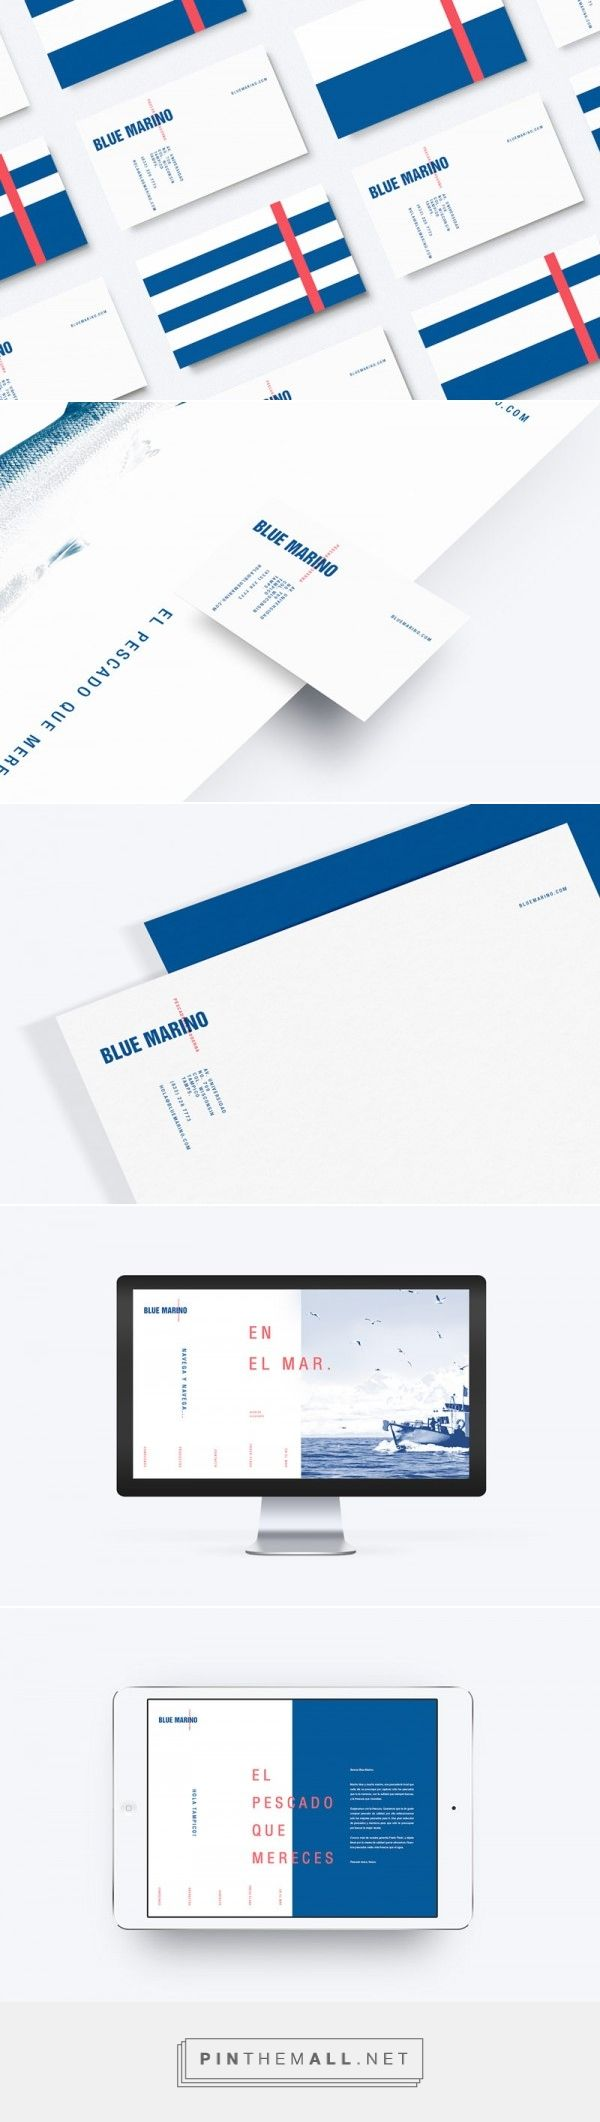 Blue Marino - Fish Market Brand Identity Design